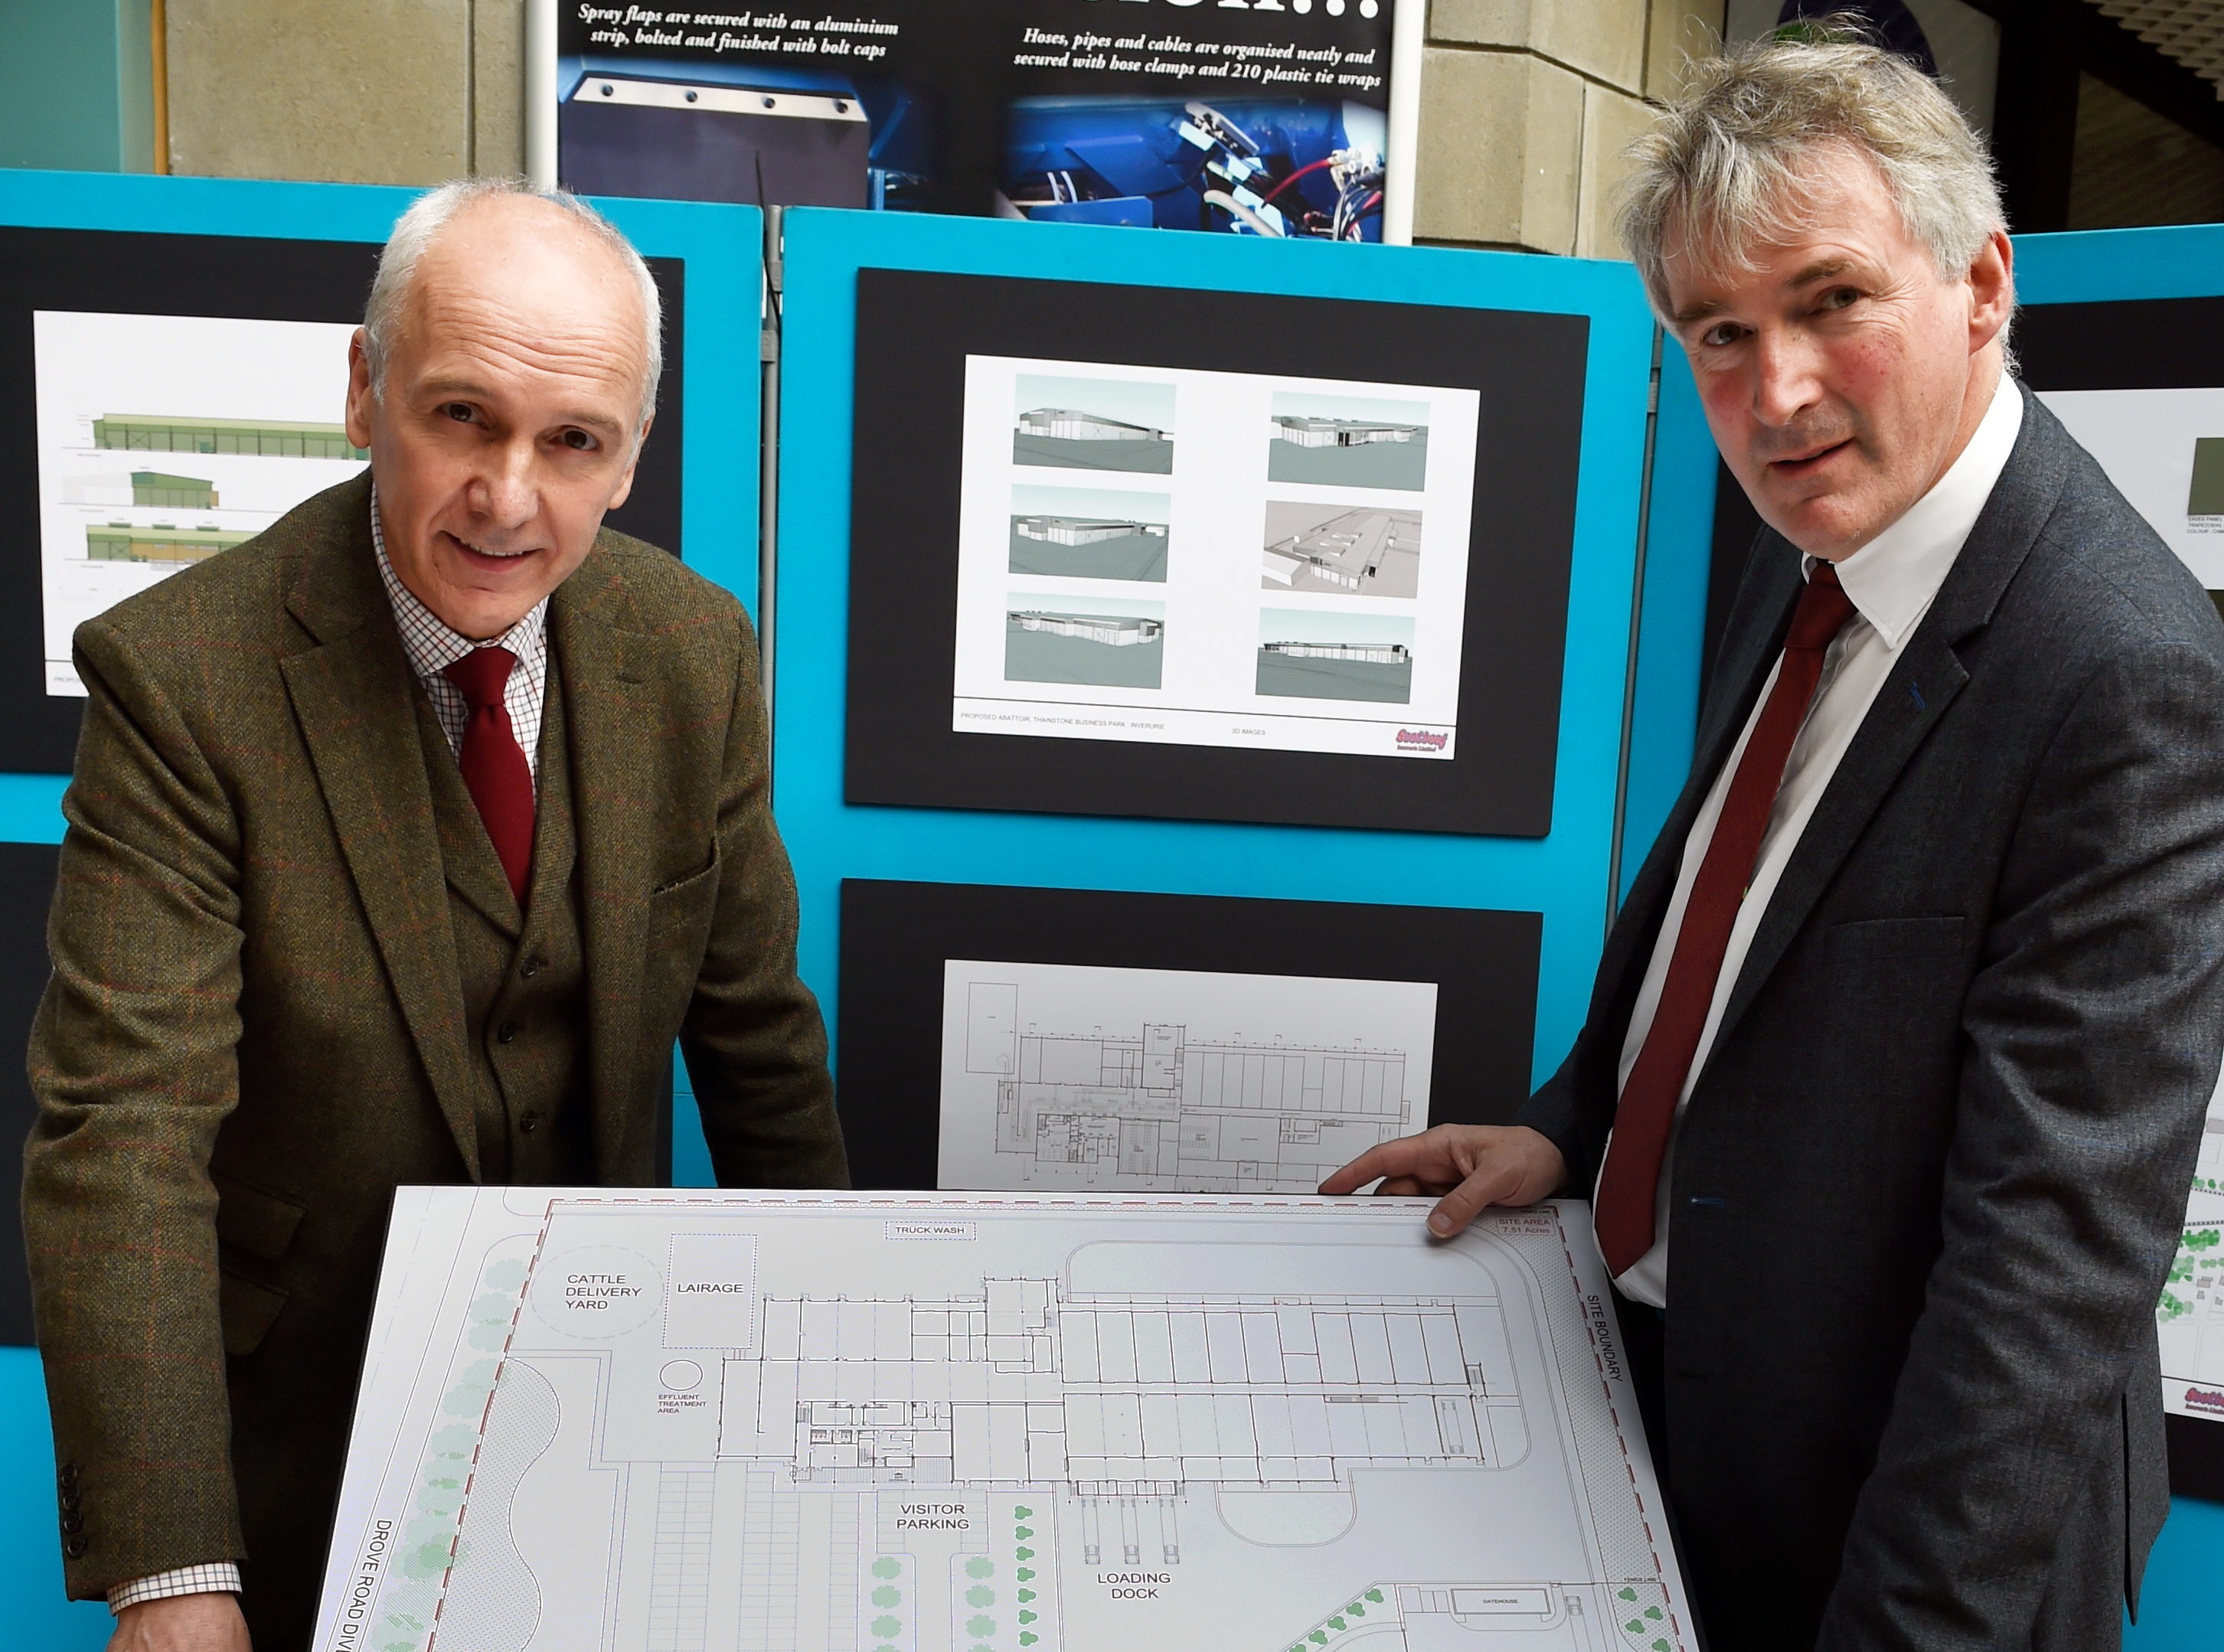 Uel Morton of ScotBeef, left, and architect David Nimmo